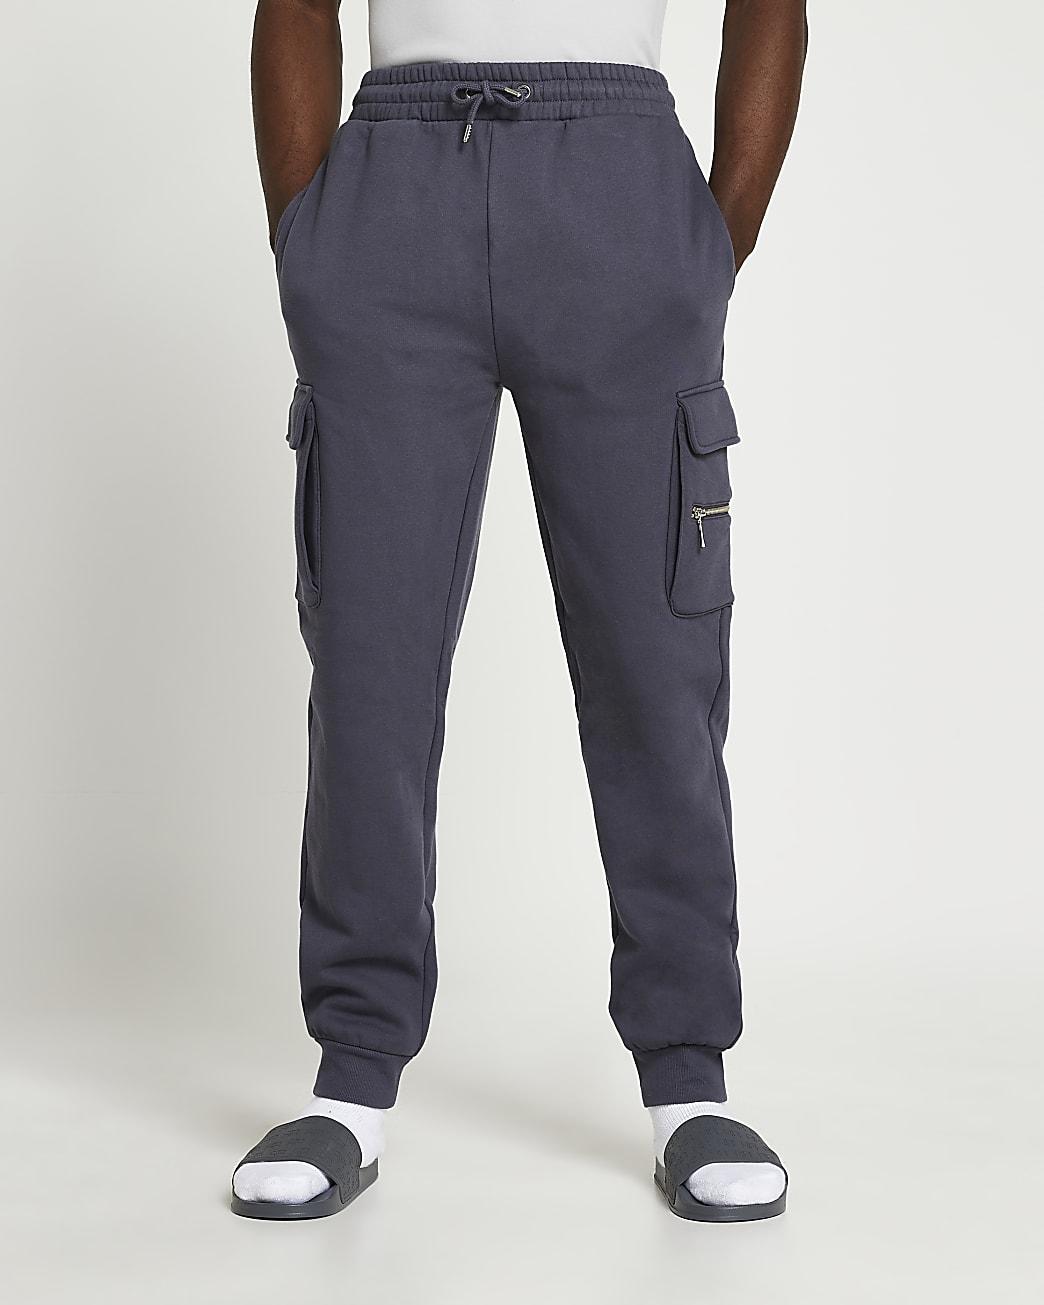 Grey slim fit cargo joggers